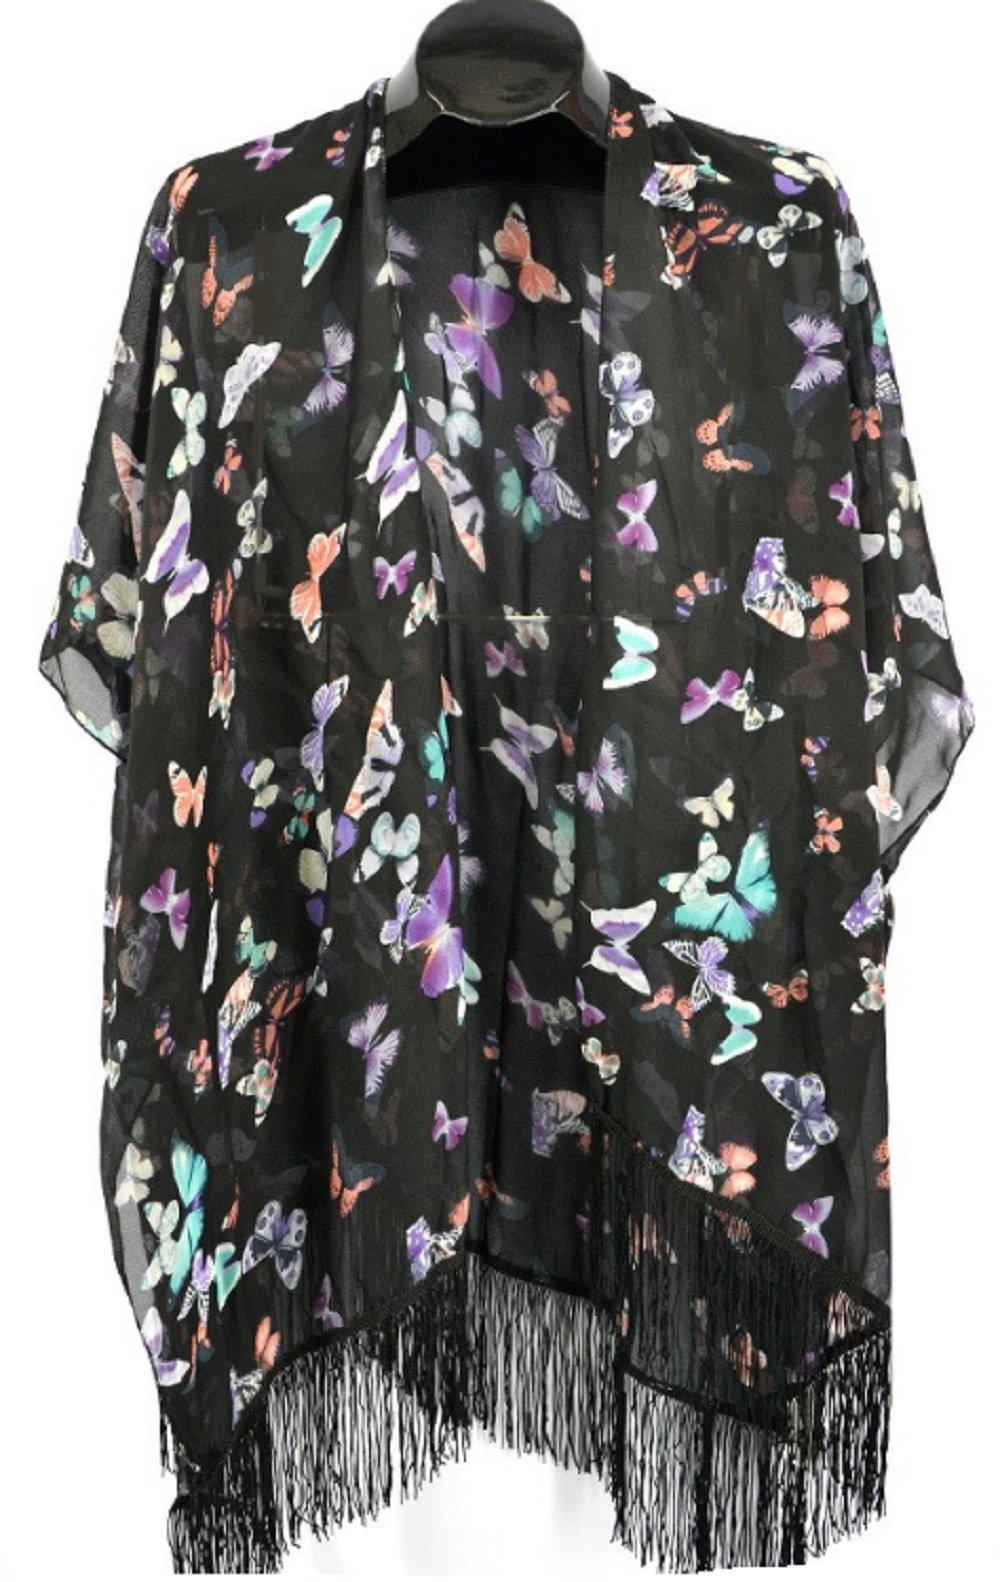 Womens Ladies Butterfly Poncho Coverup Shrug Fringed Hemline (Black)